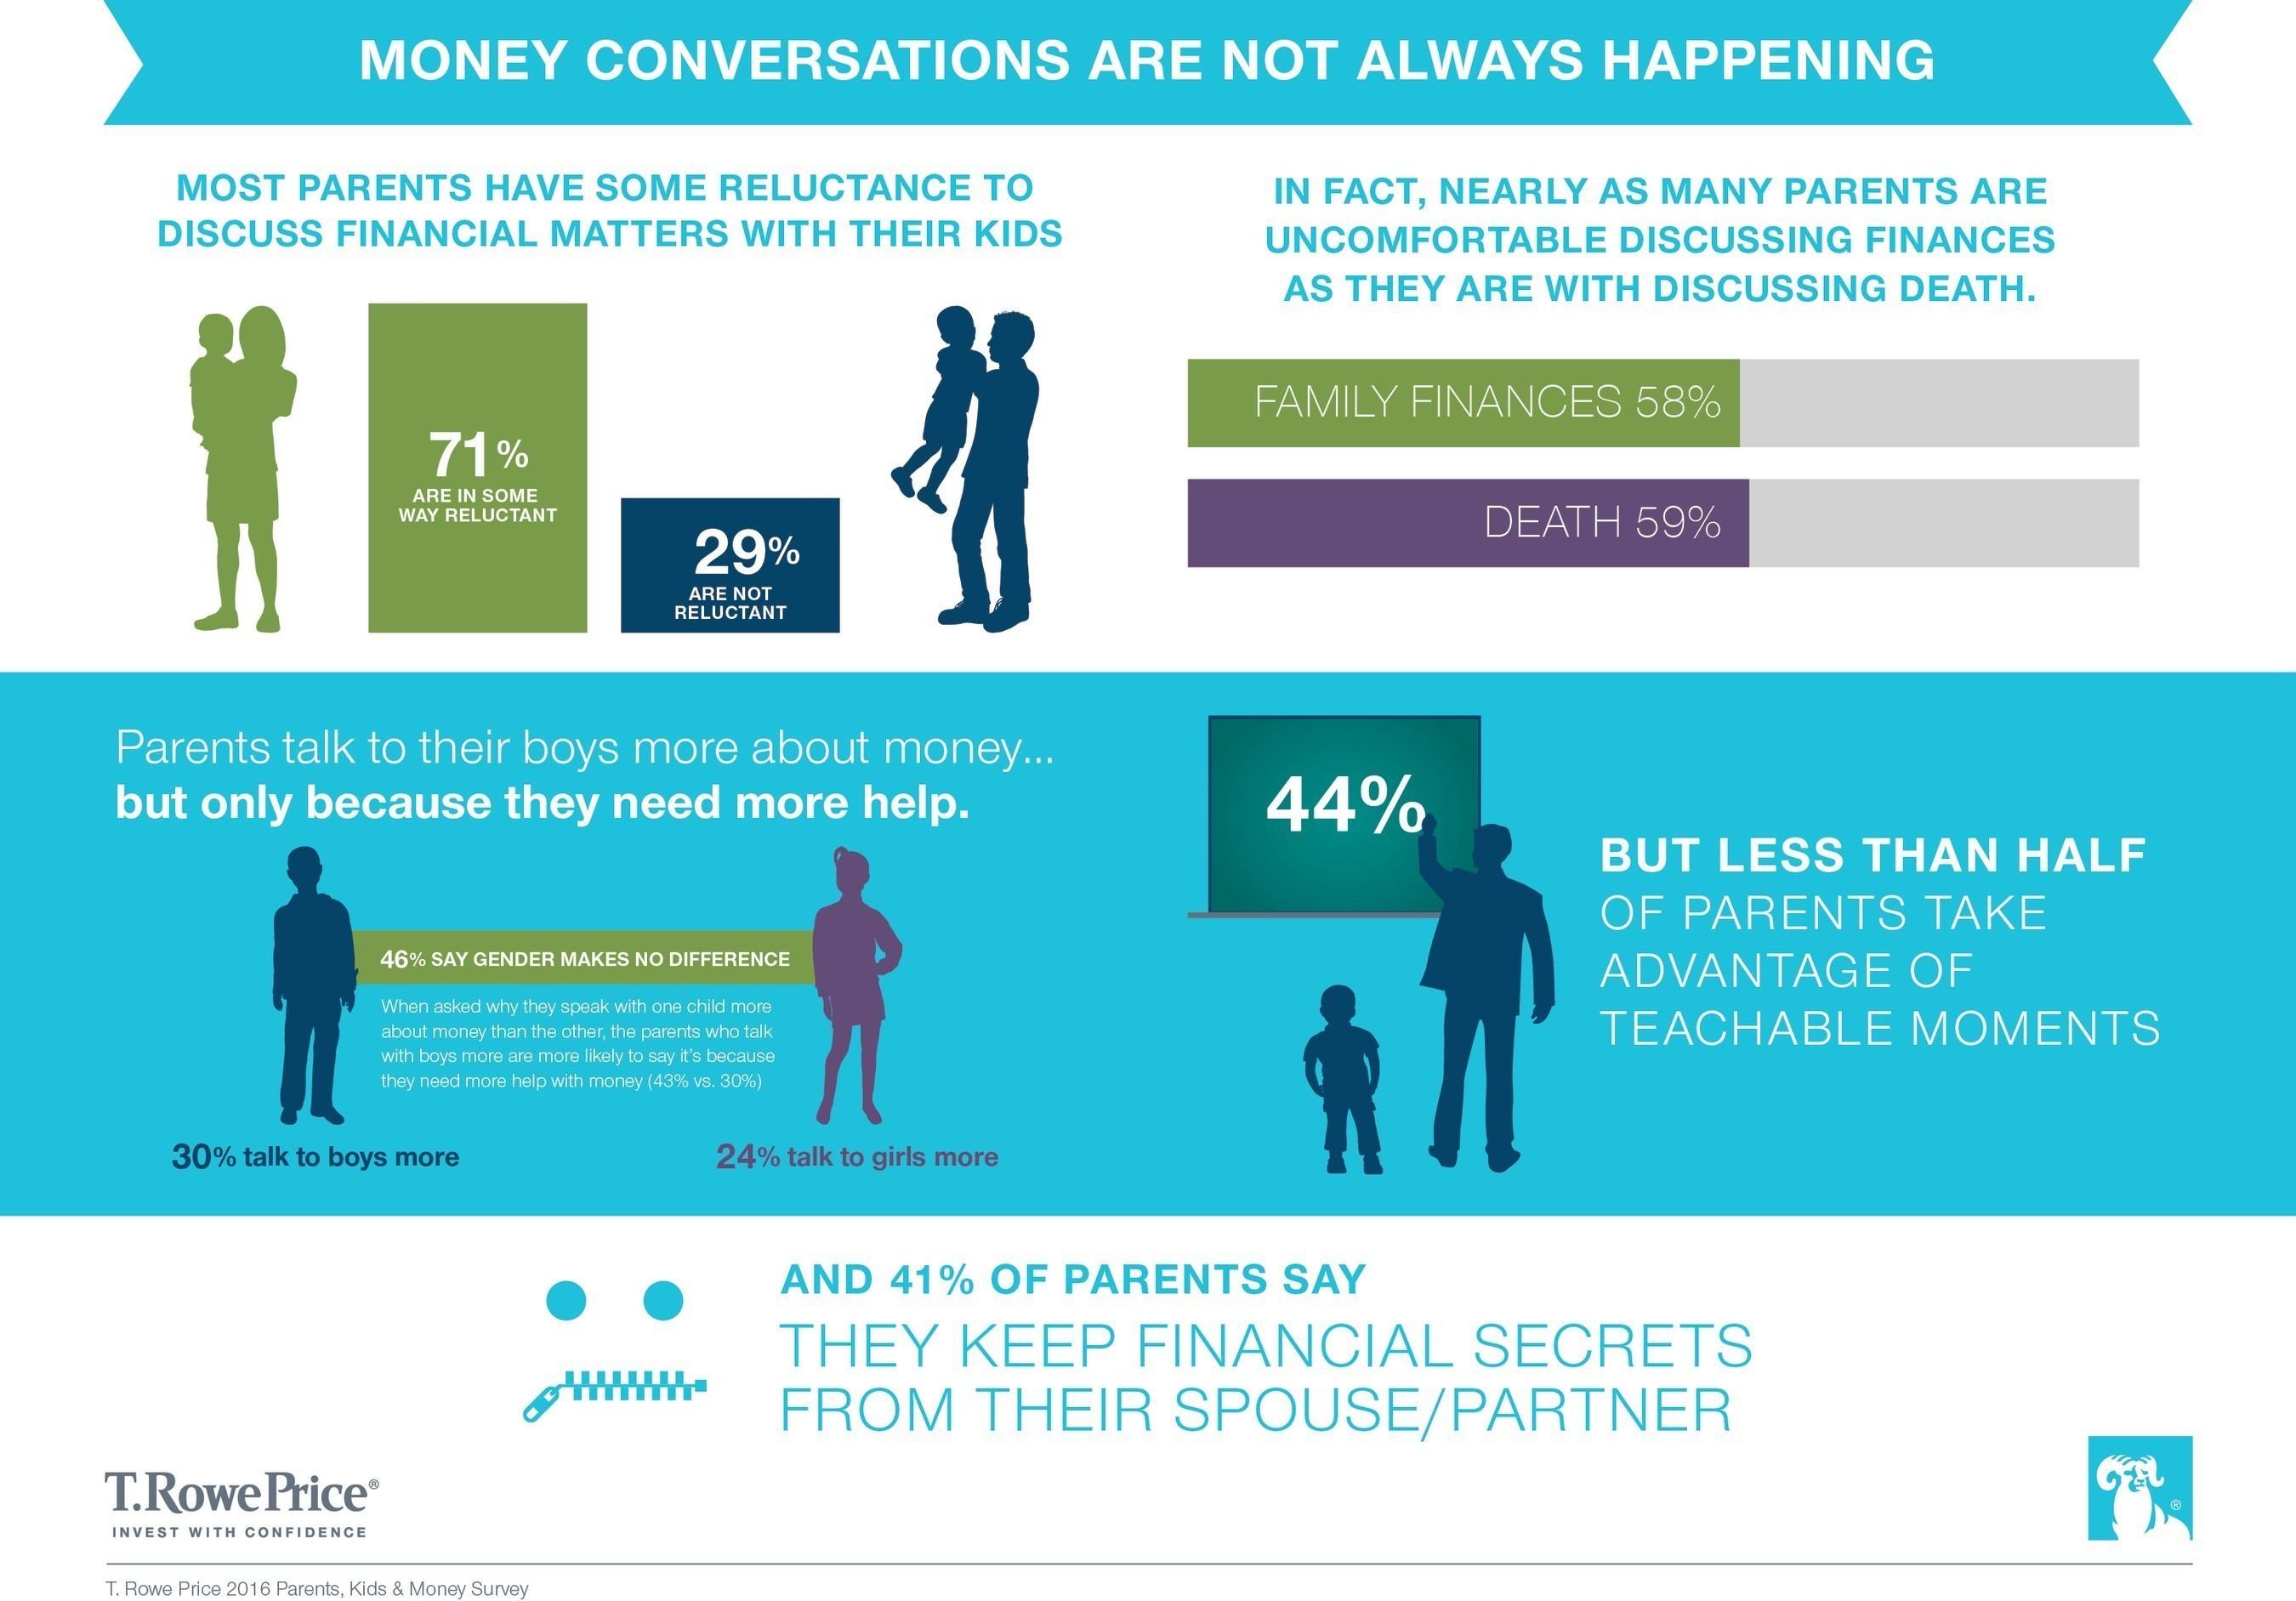 Money Conversations Are Not Always Happening